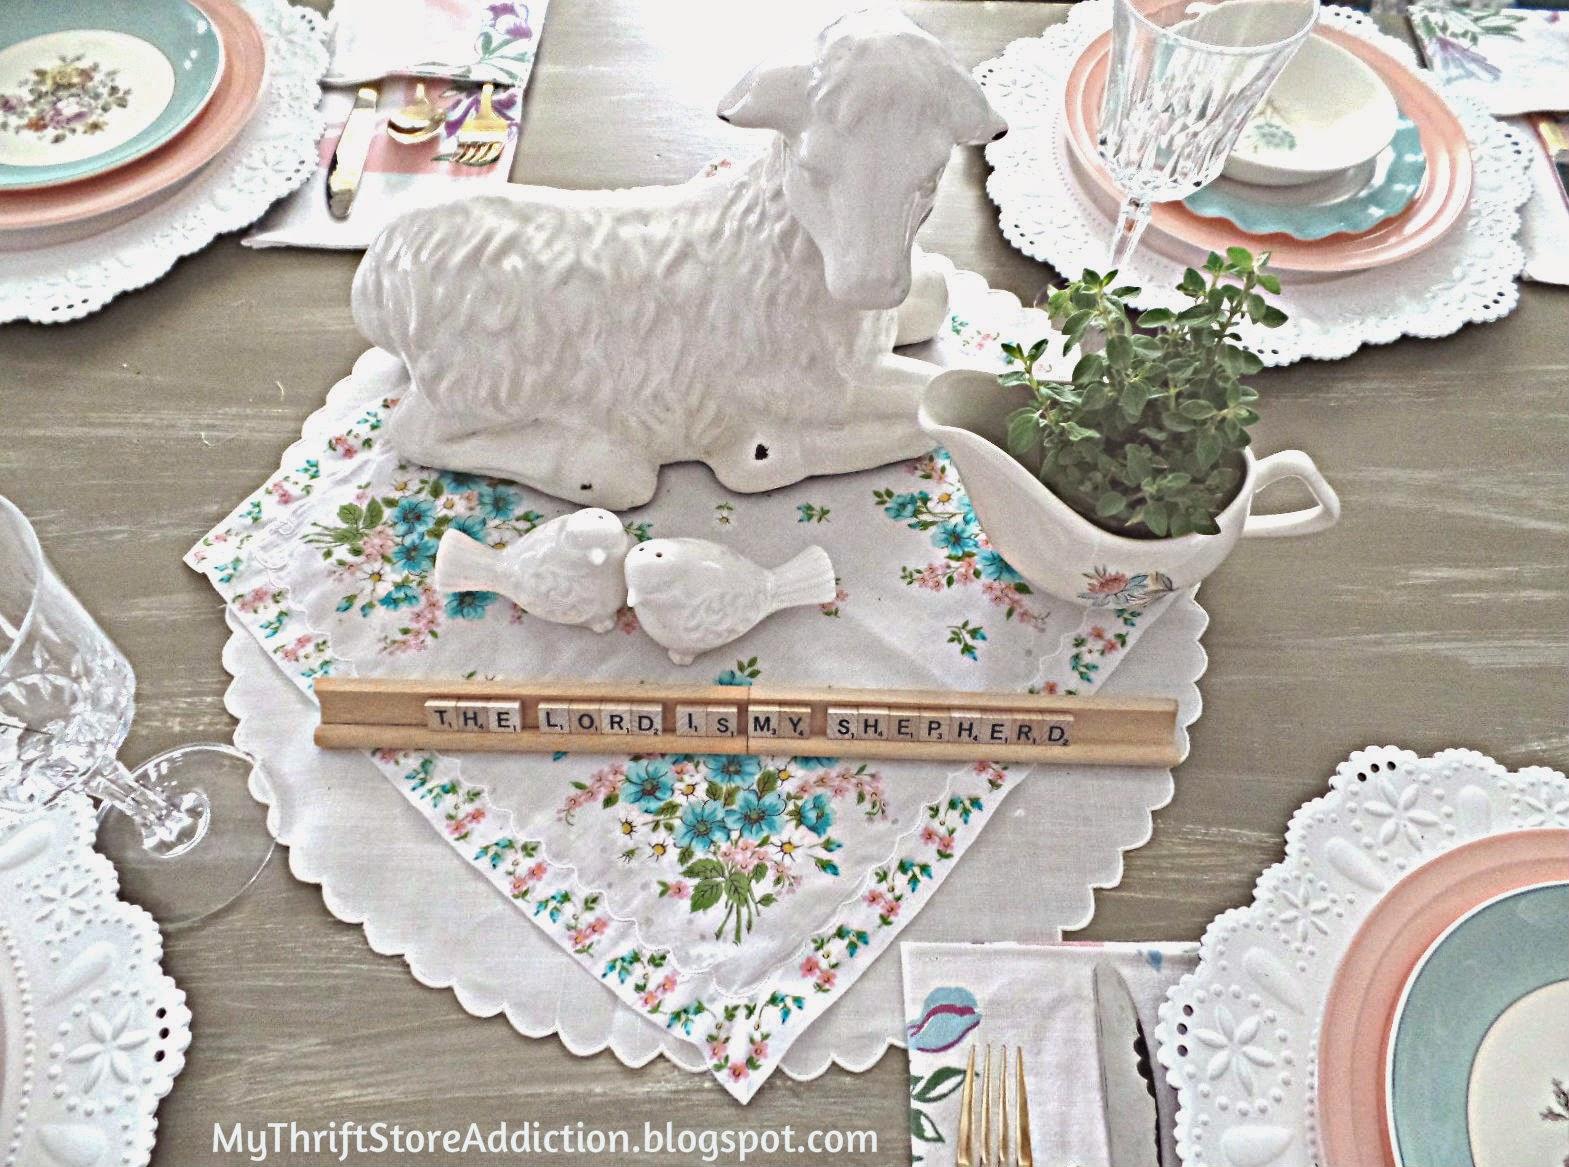 White lamb centerpiece